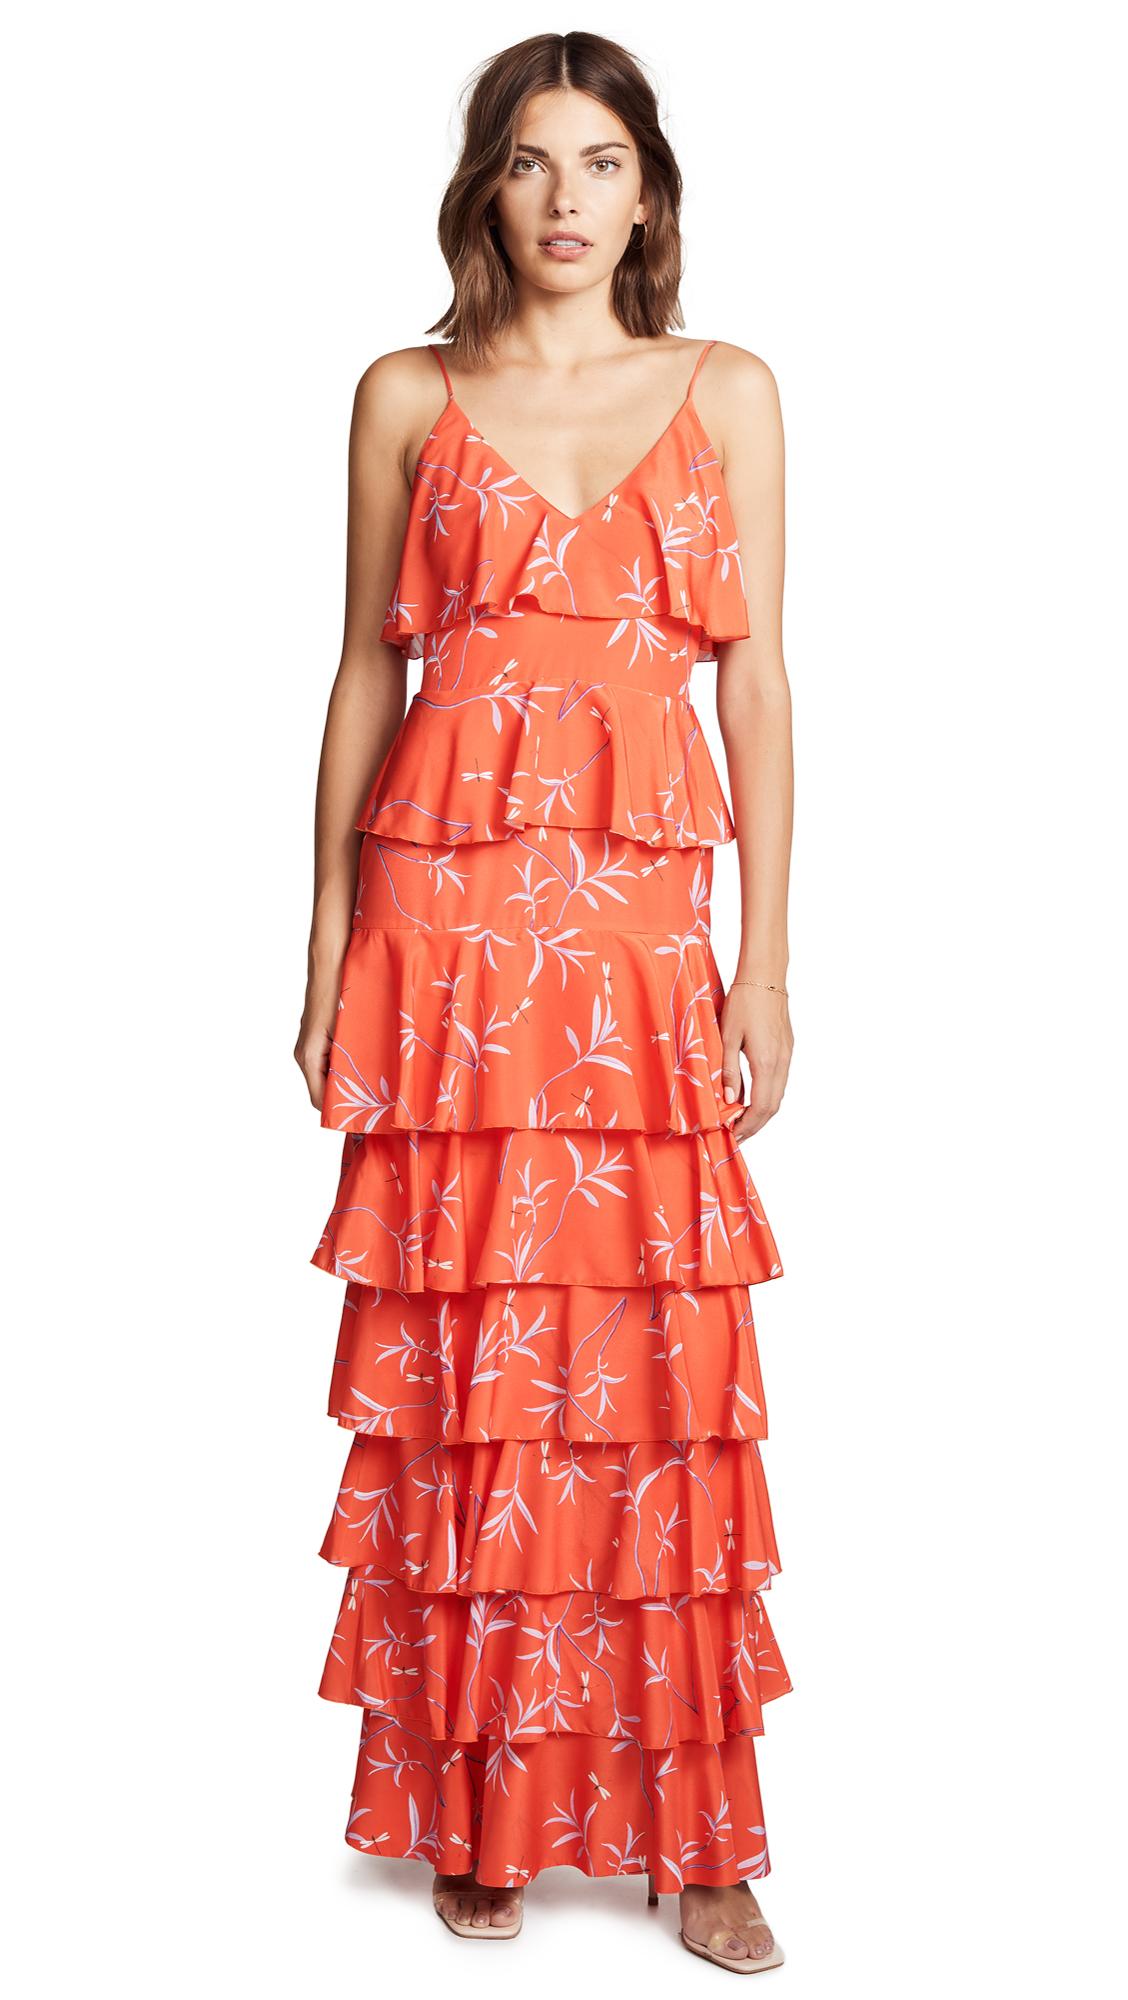 Borgo de Nor Filipa Ruffle Dress In Firefly/Red